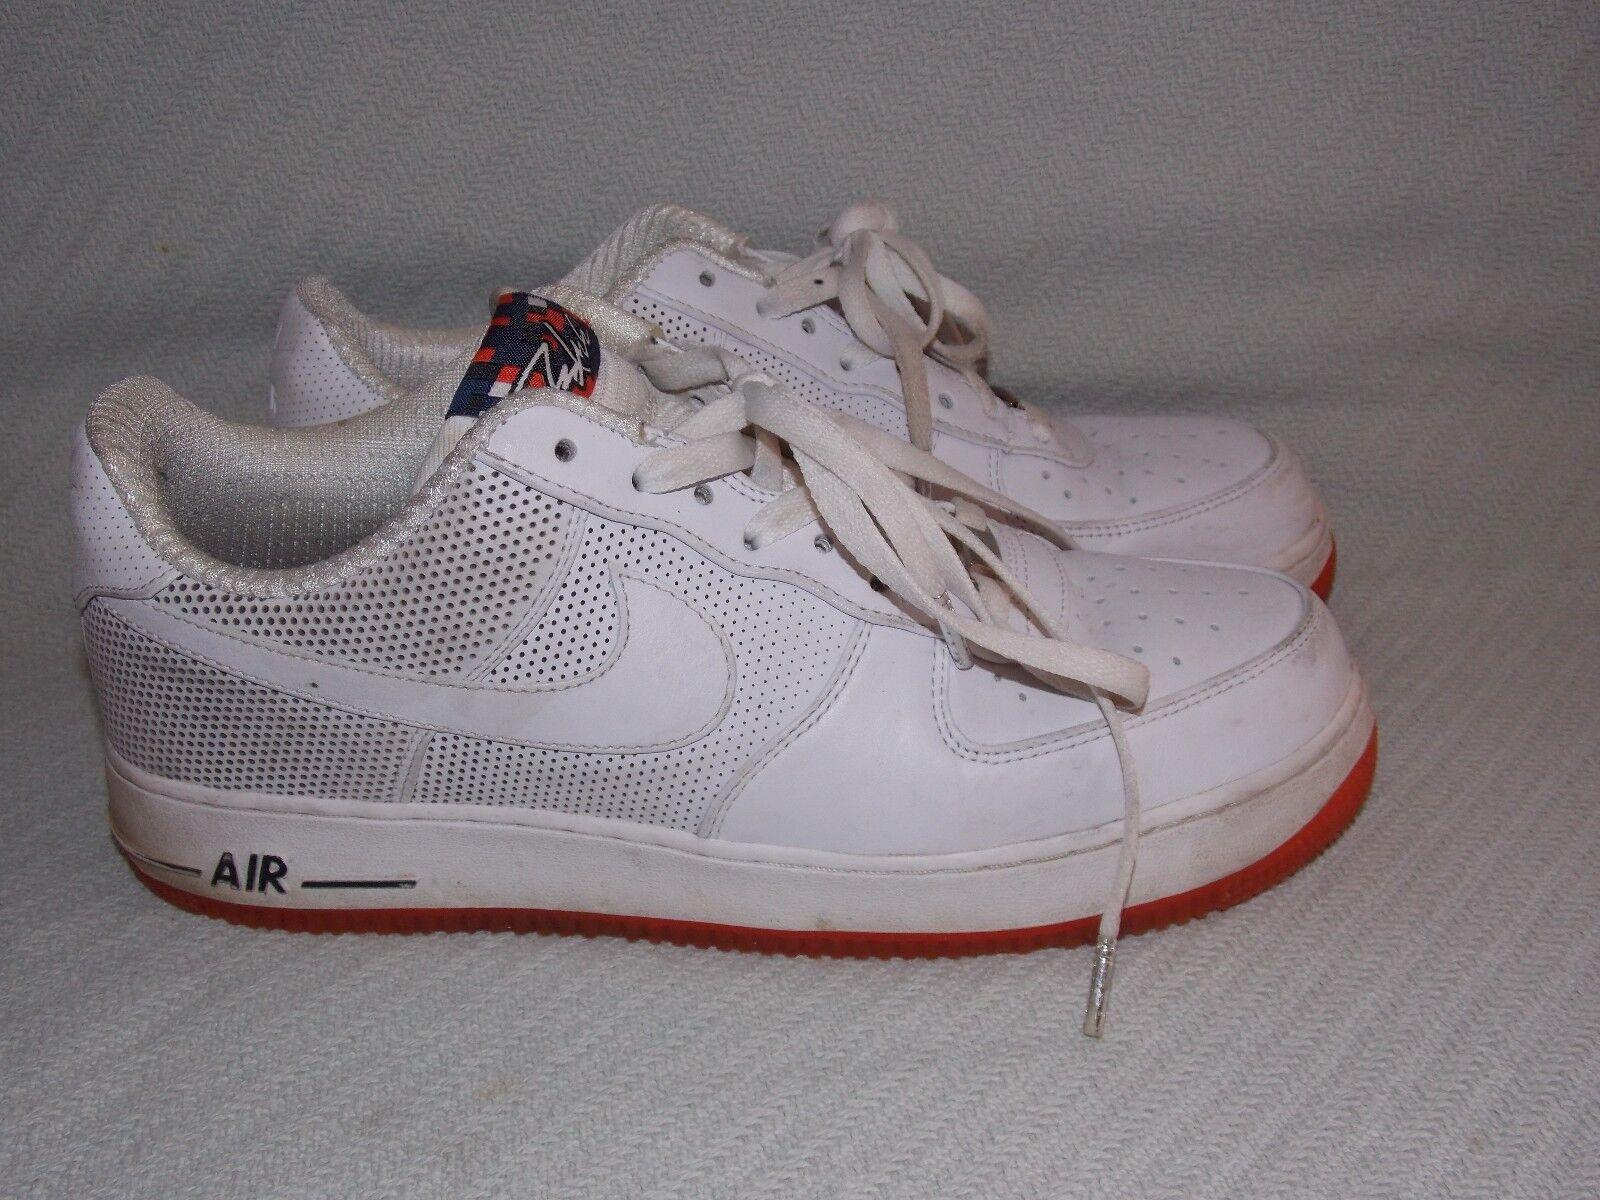 NIKE 1 Air Force 1 NIKE Low 318775-112 FUTURA Be True Basketball Sneakers Size 10.5 f1162e